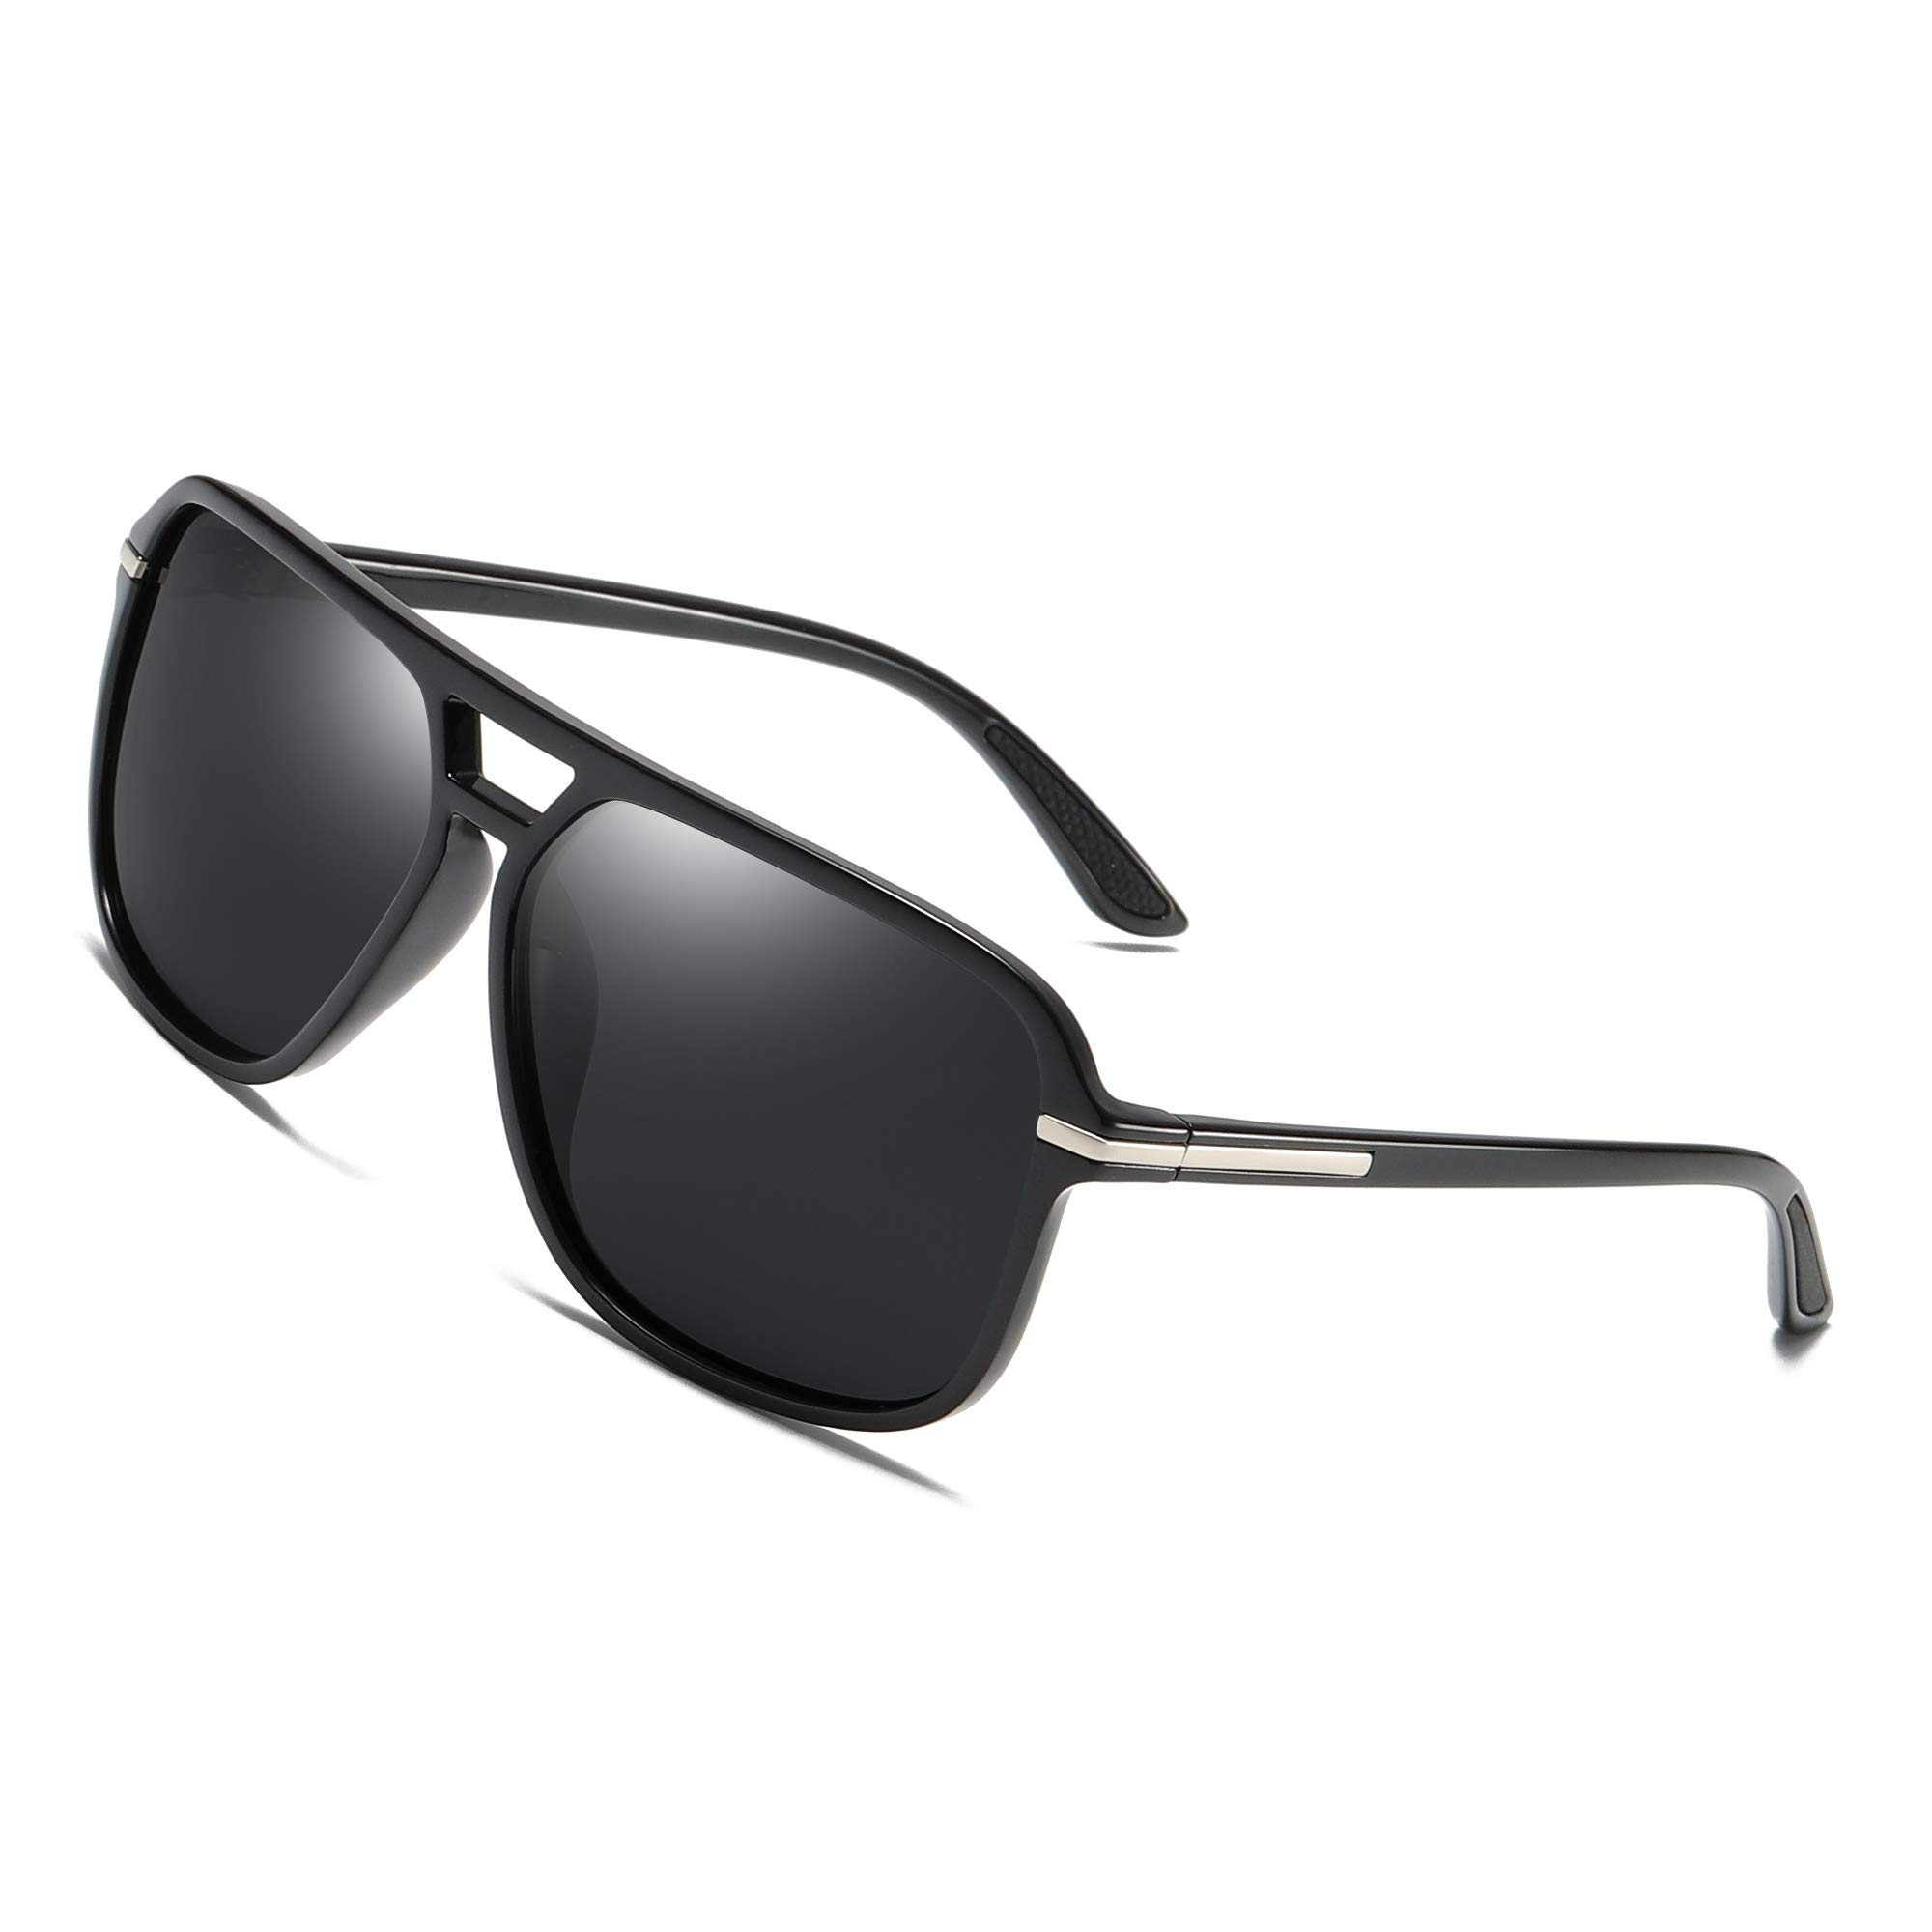 Polarized Sunglasses for Men Aviator Driving Women Mens Sunglasses Rectangular Vintage Sun Glasses (Black Lens (Rubber Coating Ear Pieces)) by GOBIGER